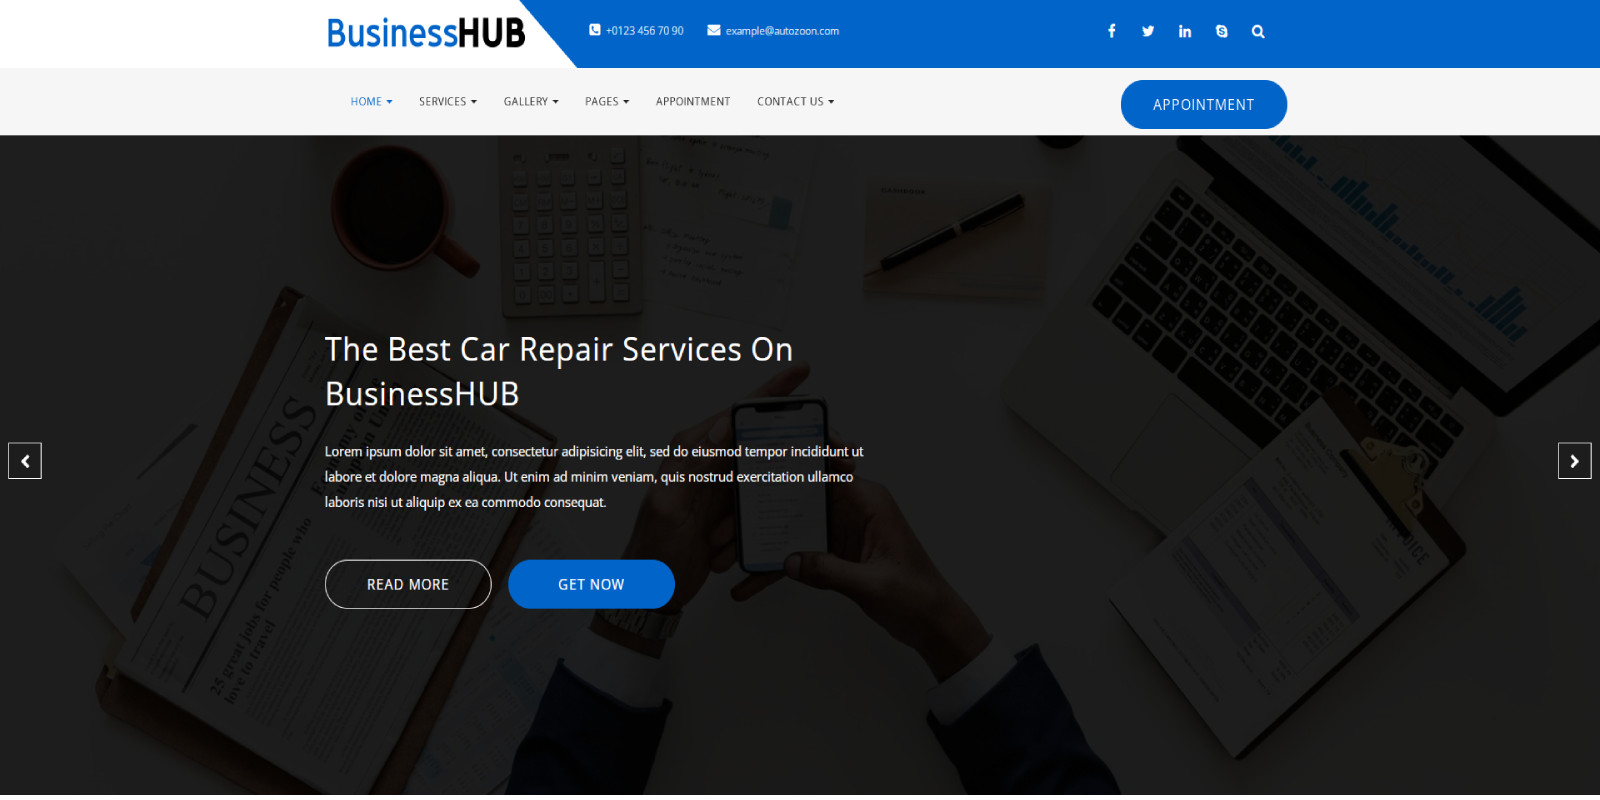 BusinessHUB - Multi-purpose HTML5 Templates